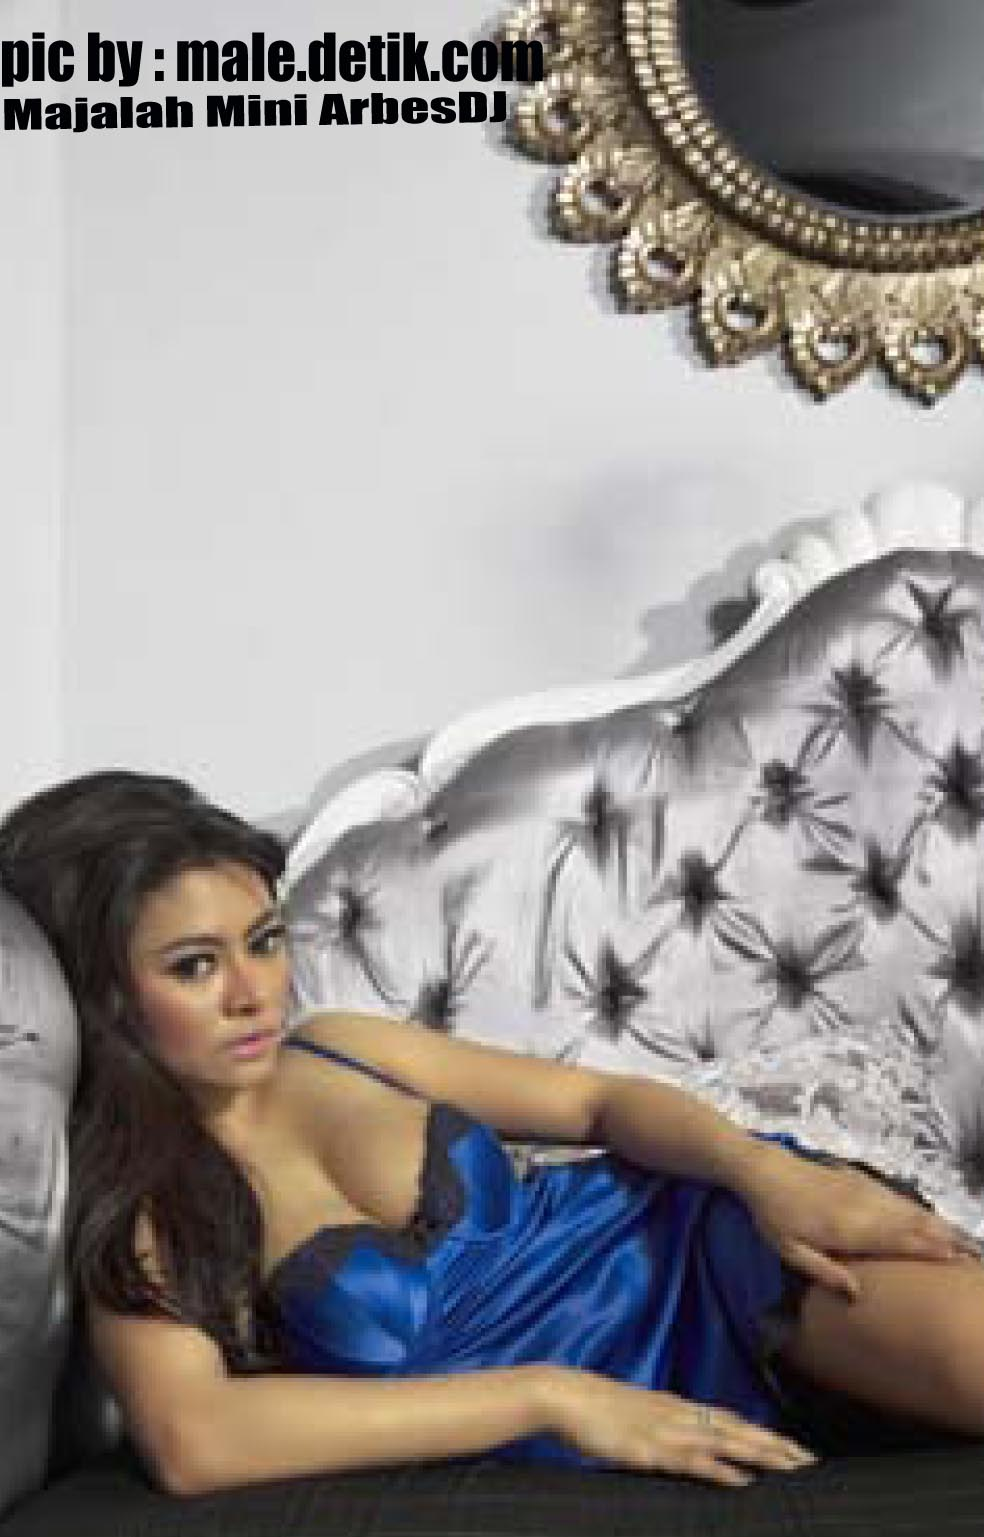 HOT : Foto Sexy Vitalia Shesya Di Majalah Male Digital ...